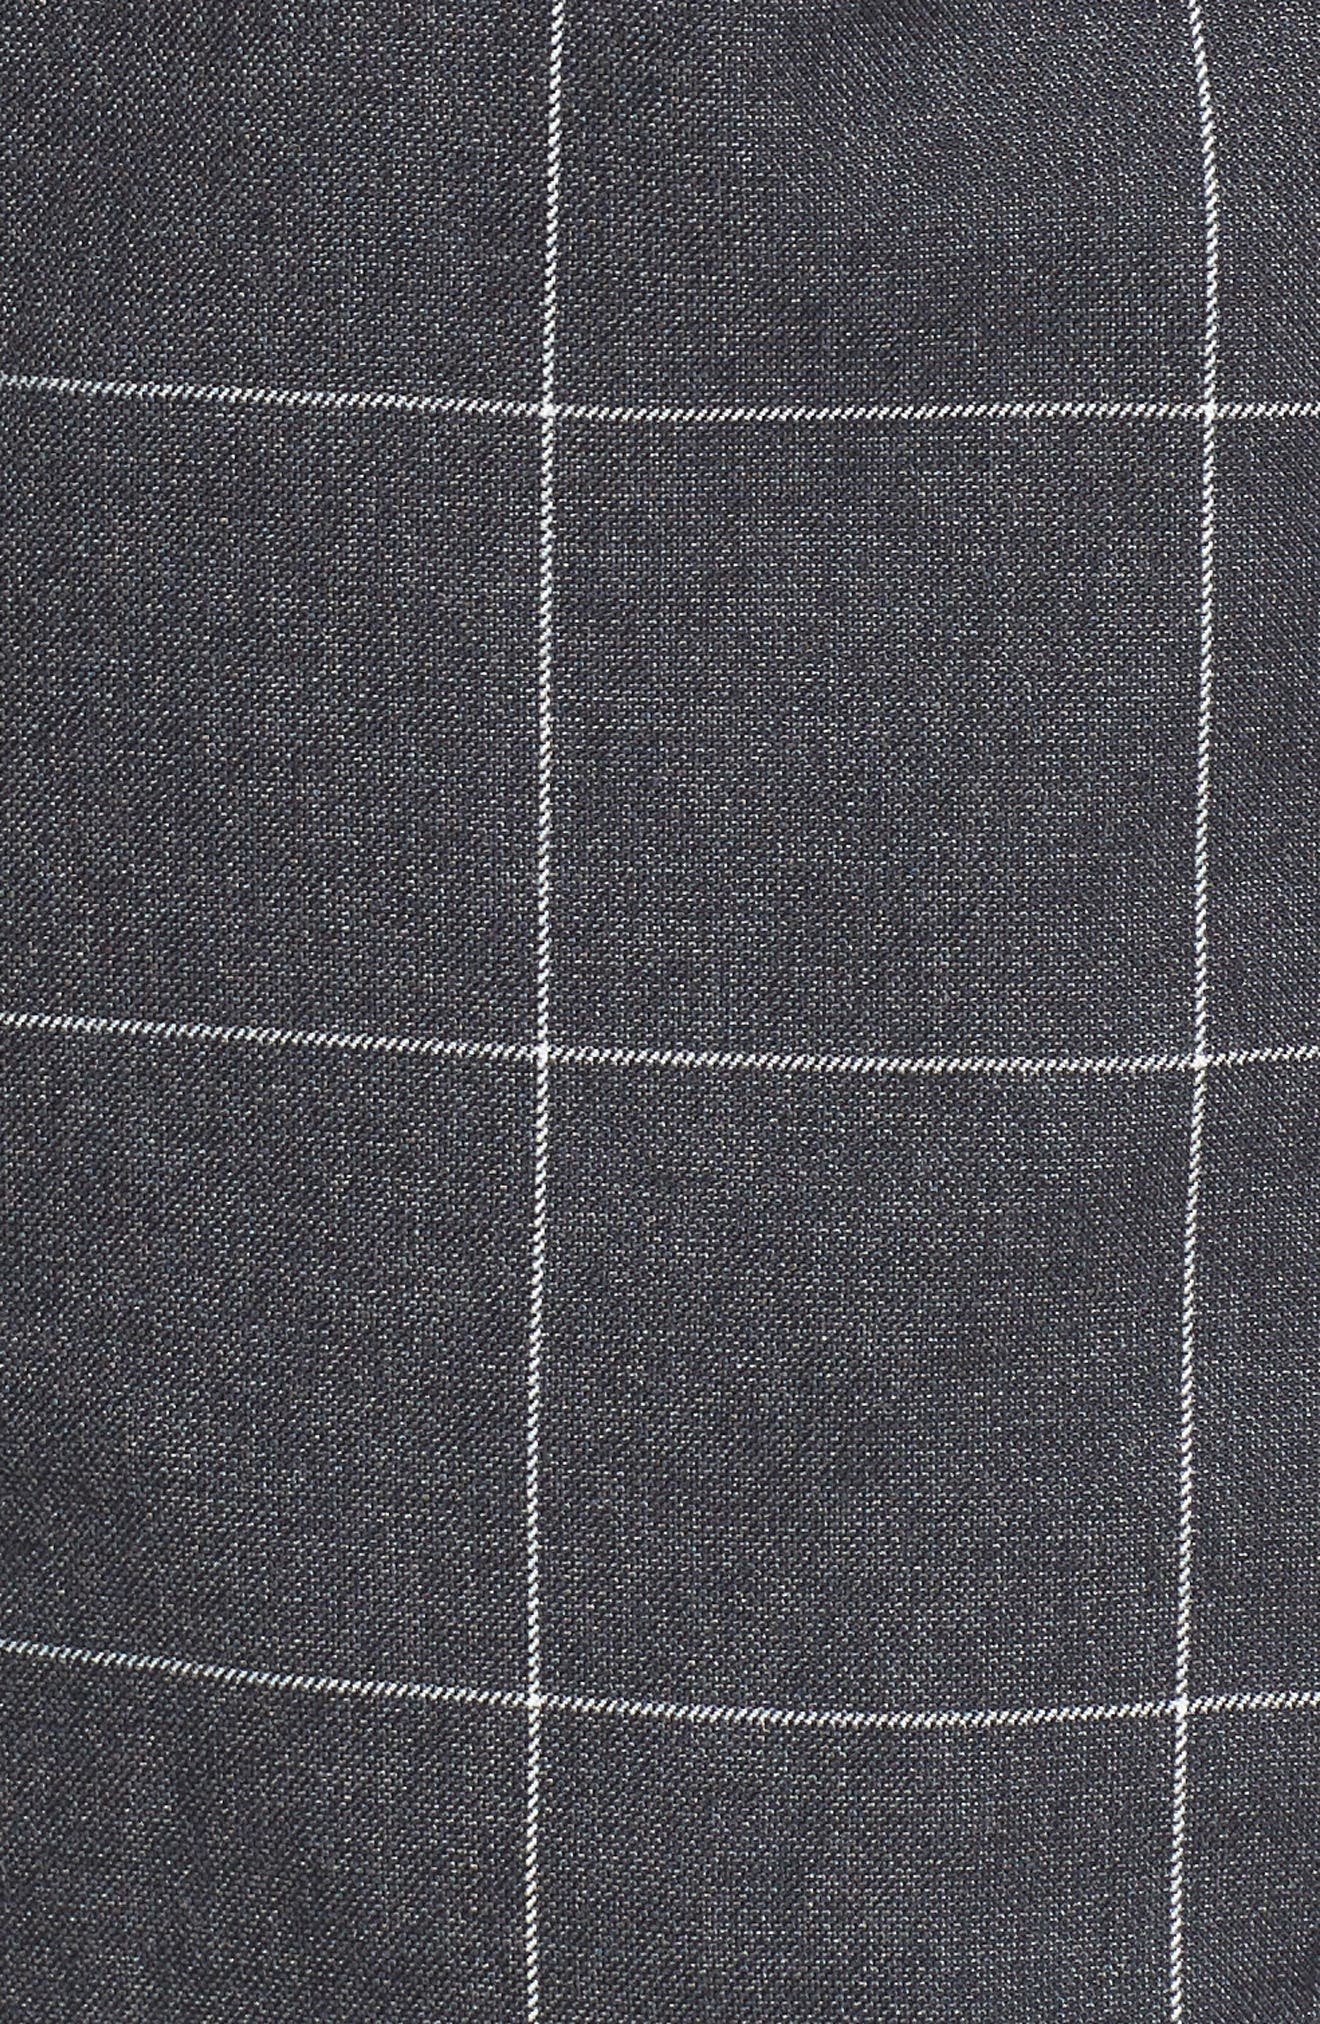 Check Flannel Bomber Jacket,                             Alternate thumbnail 5, color,                             419